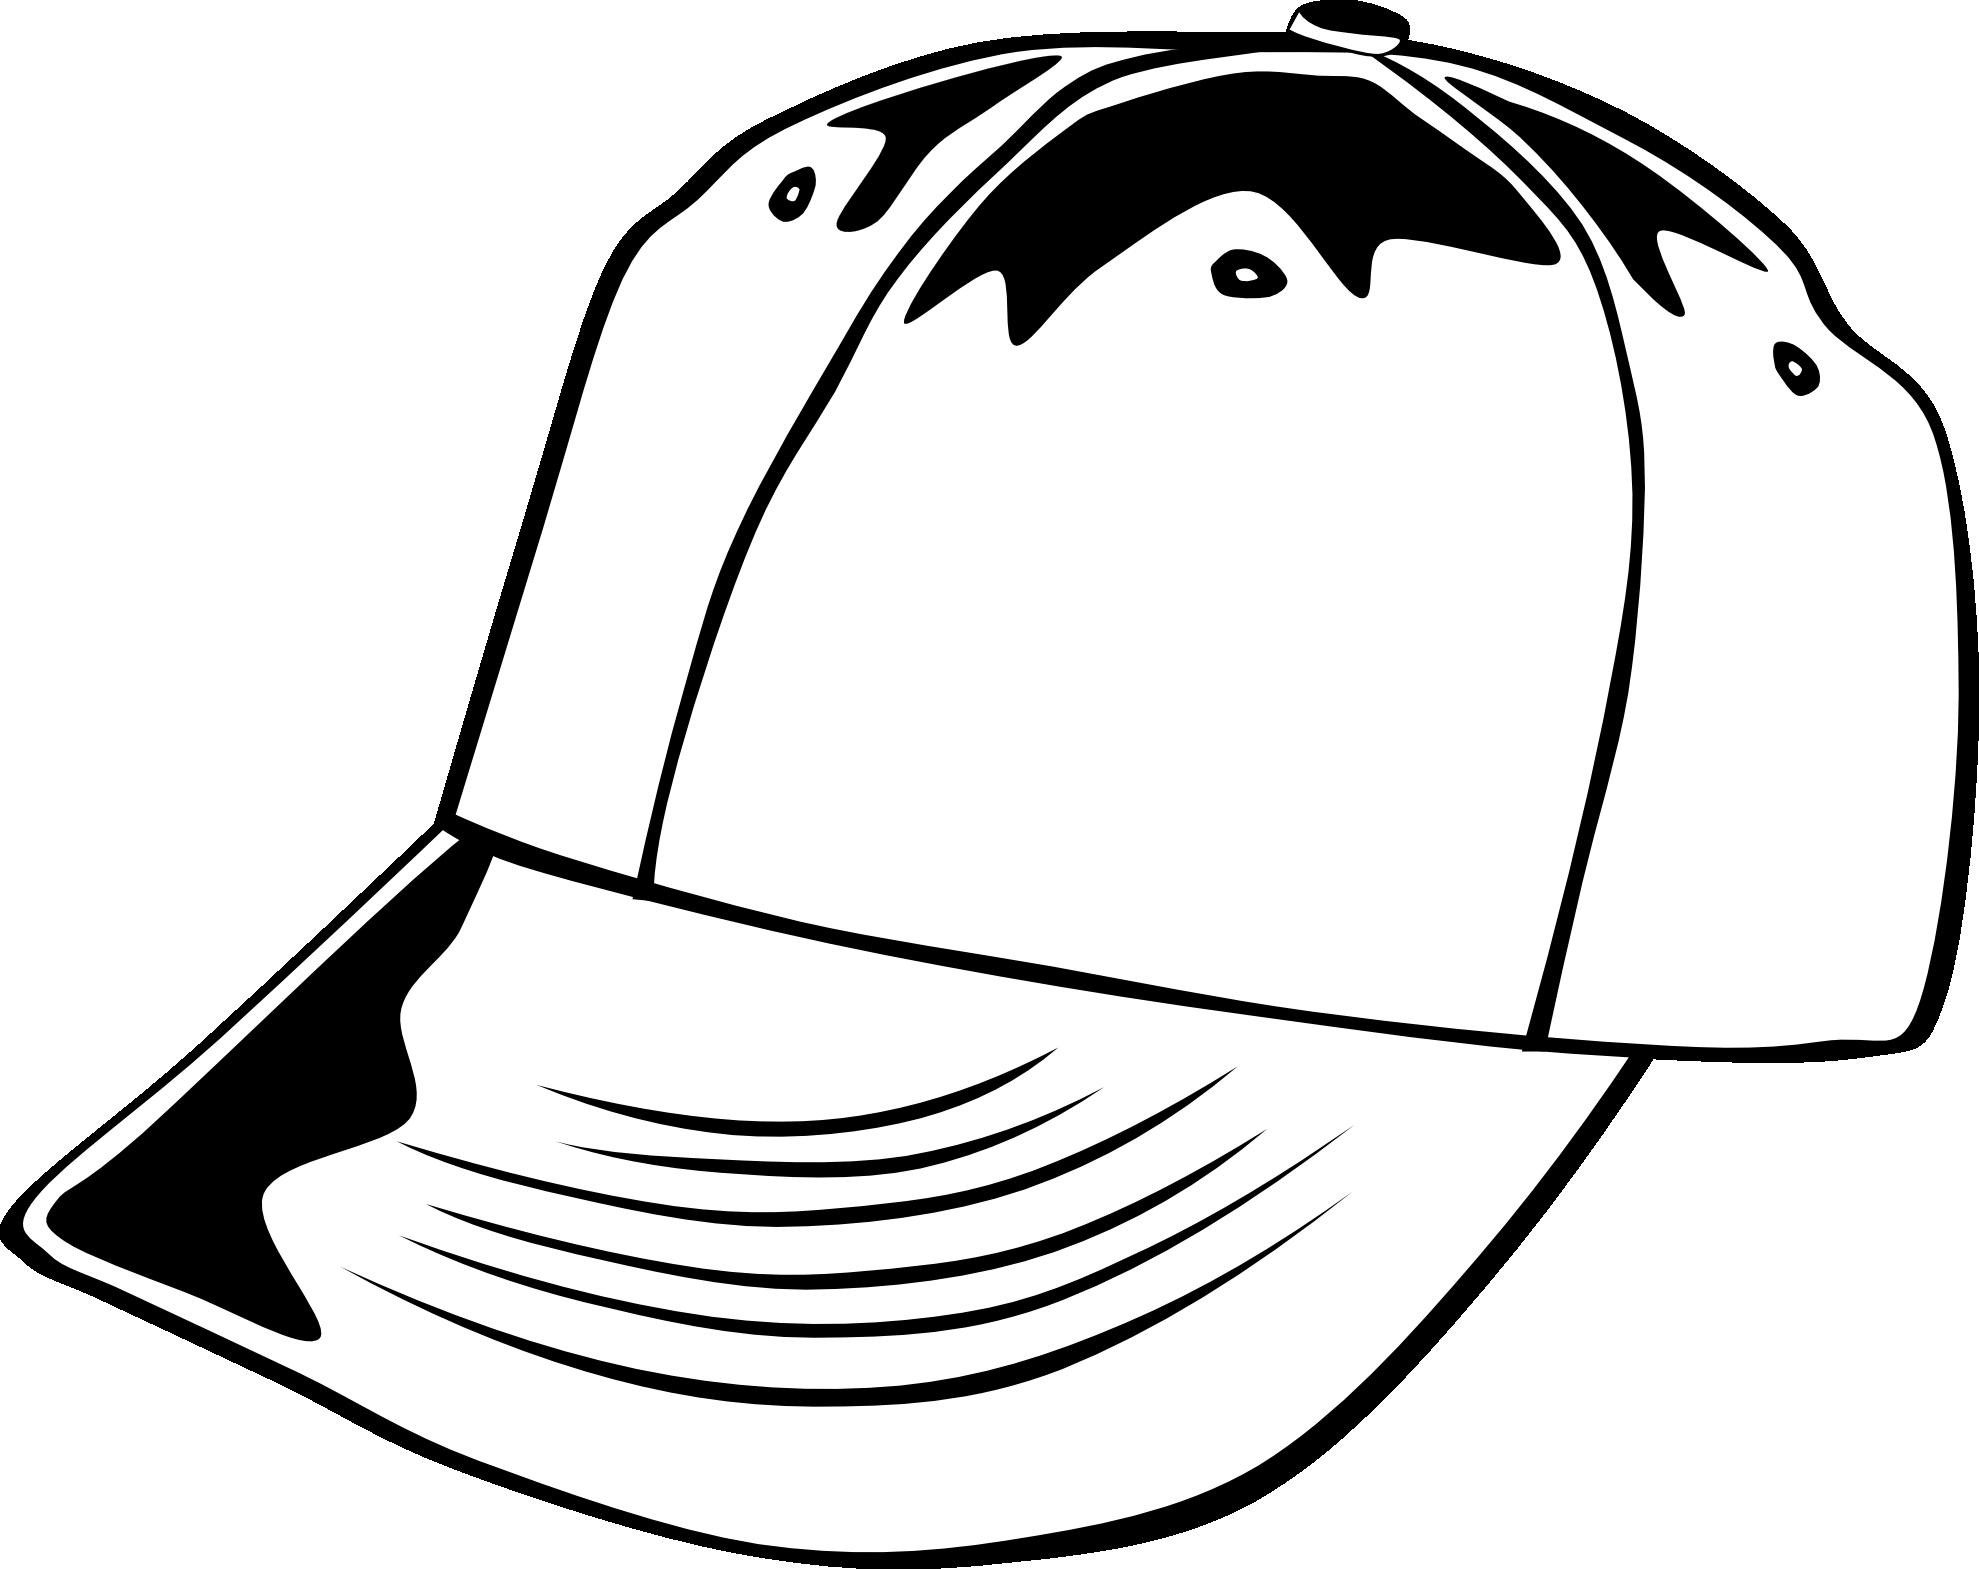 d5fd76eda37 Baseball clipart black and white  Baseball Cap 1 Black White - Caps PNG  Black And